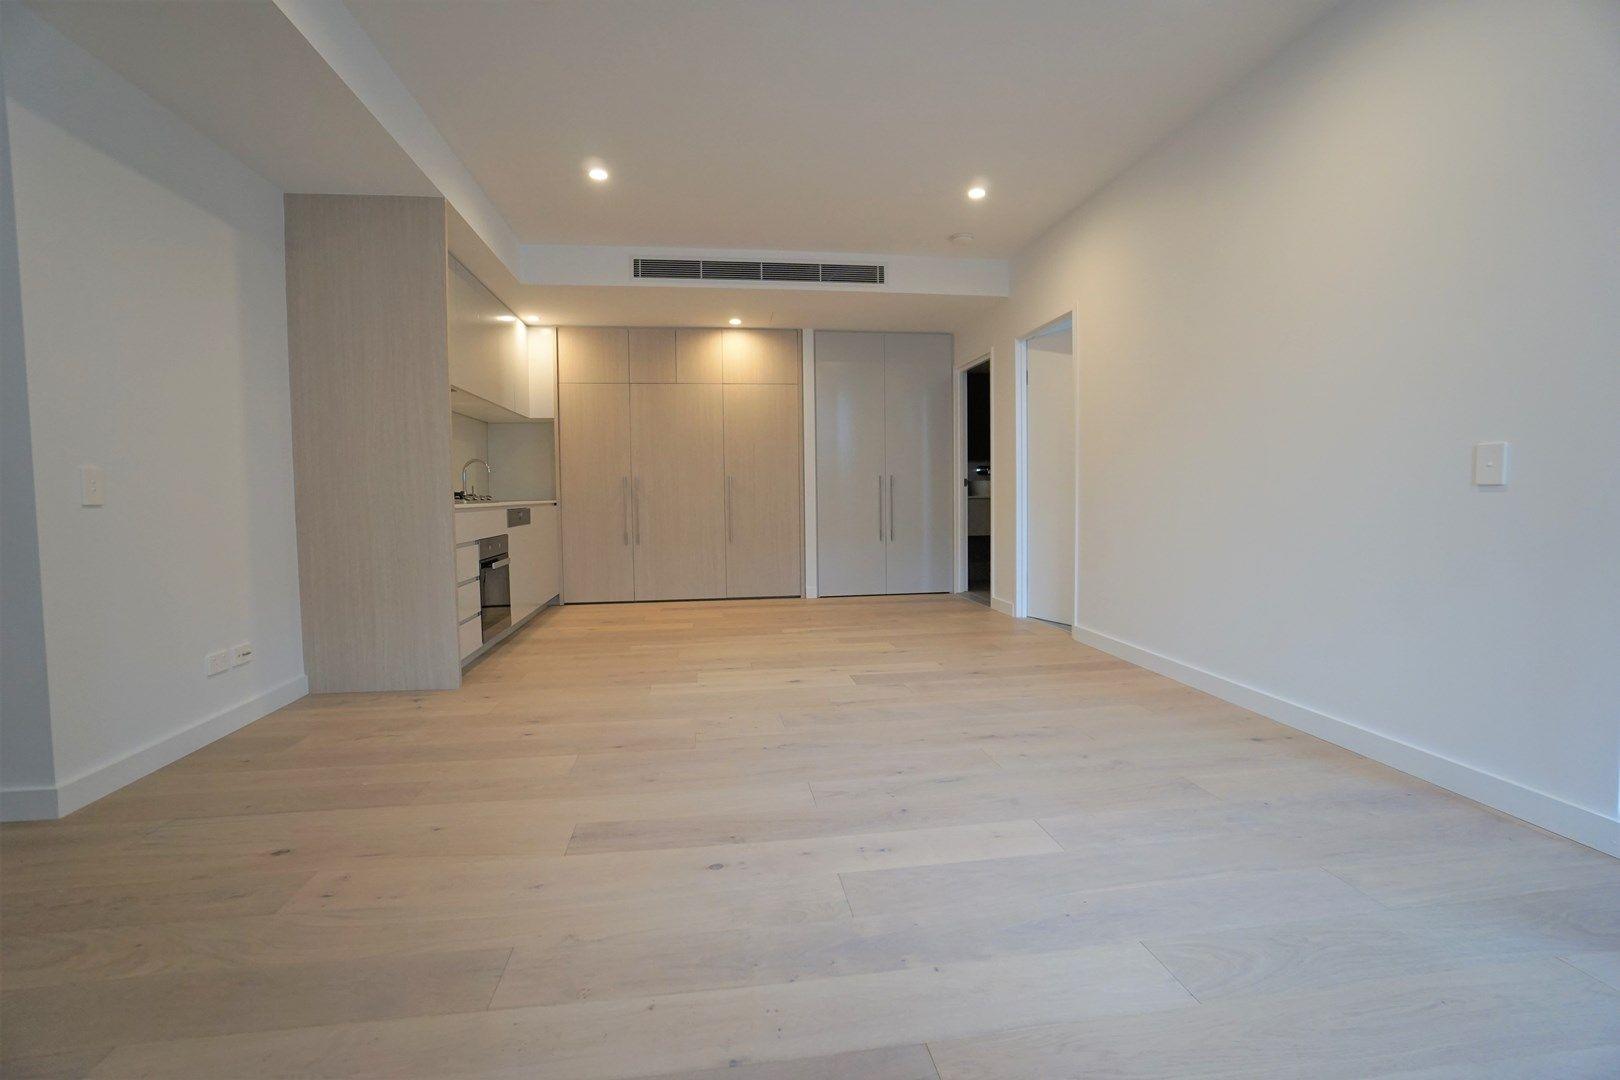 4.201/18 Hannah Street, Beecroft NSW 2119, Image 0